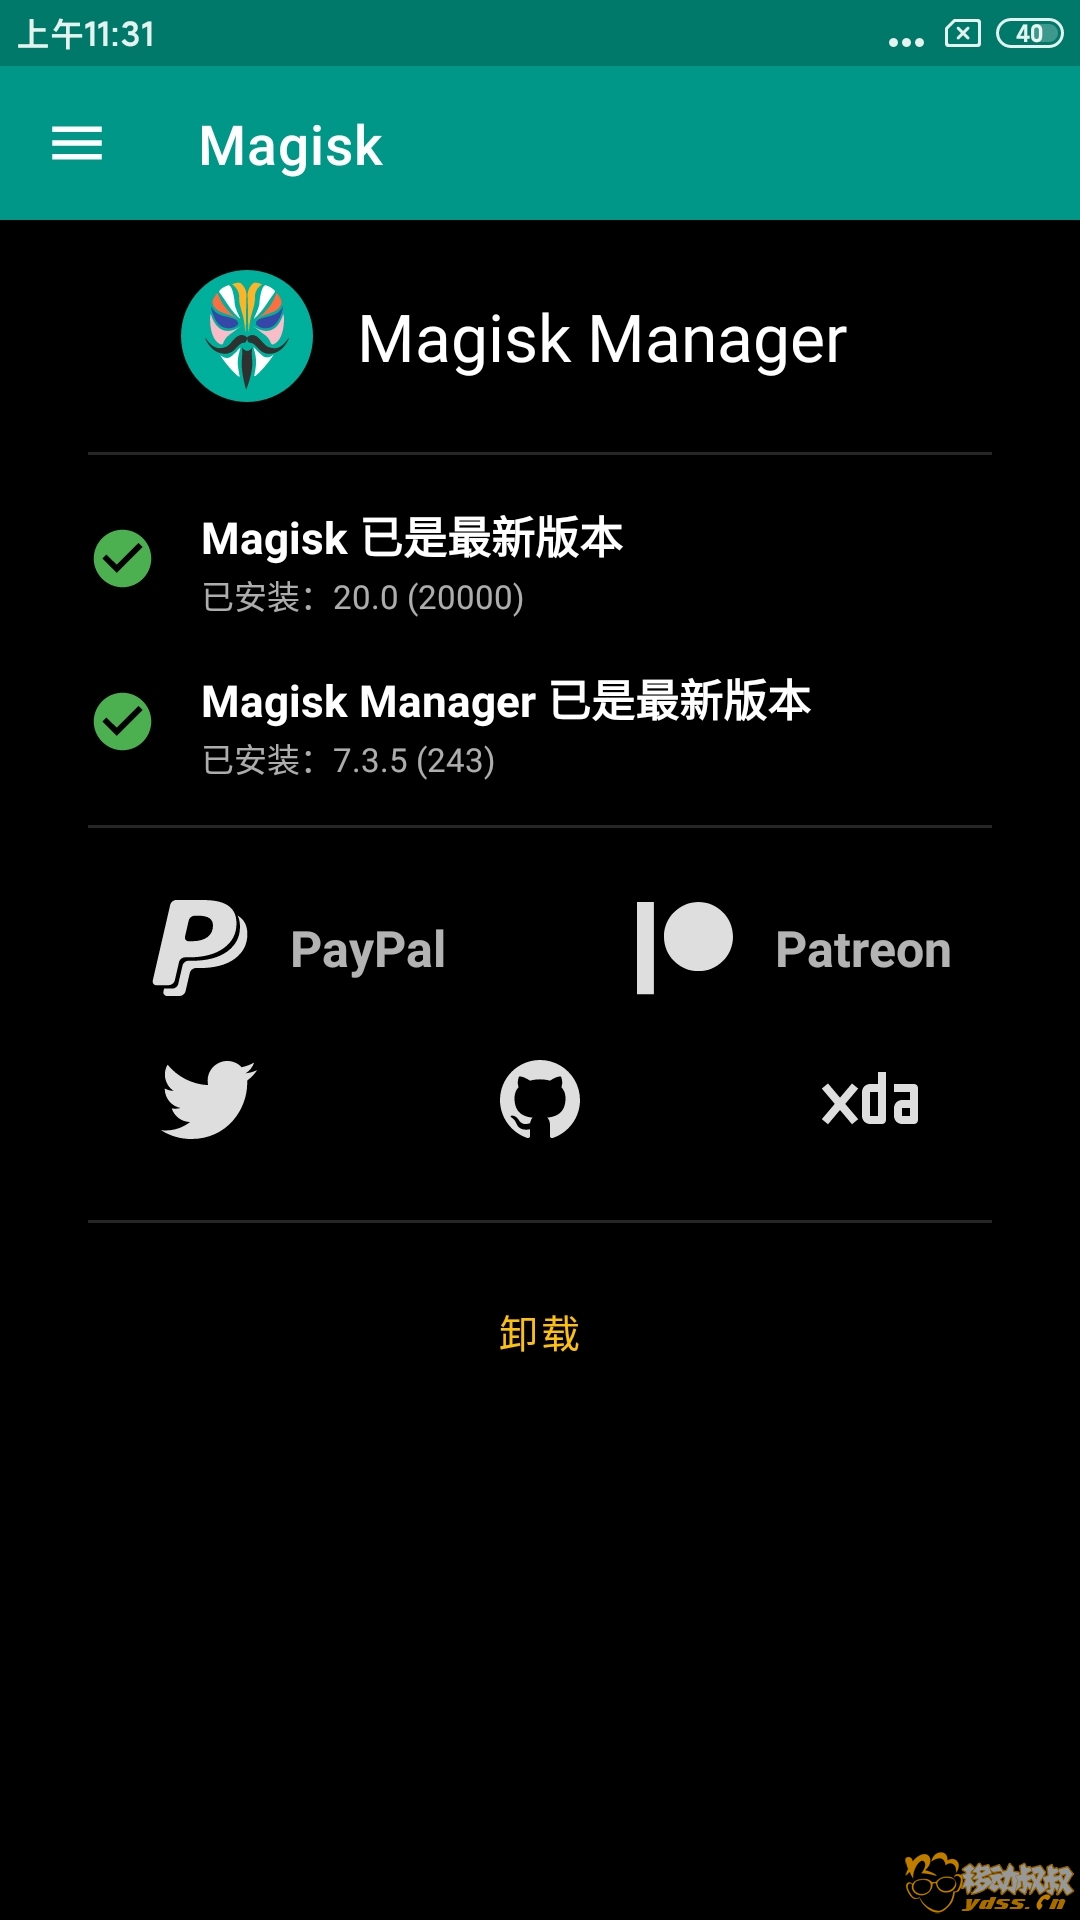 Screenshot_2019-11-16-11-31-32-469_com.topjohnwu.magisk.jpg